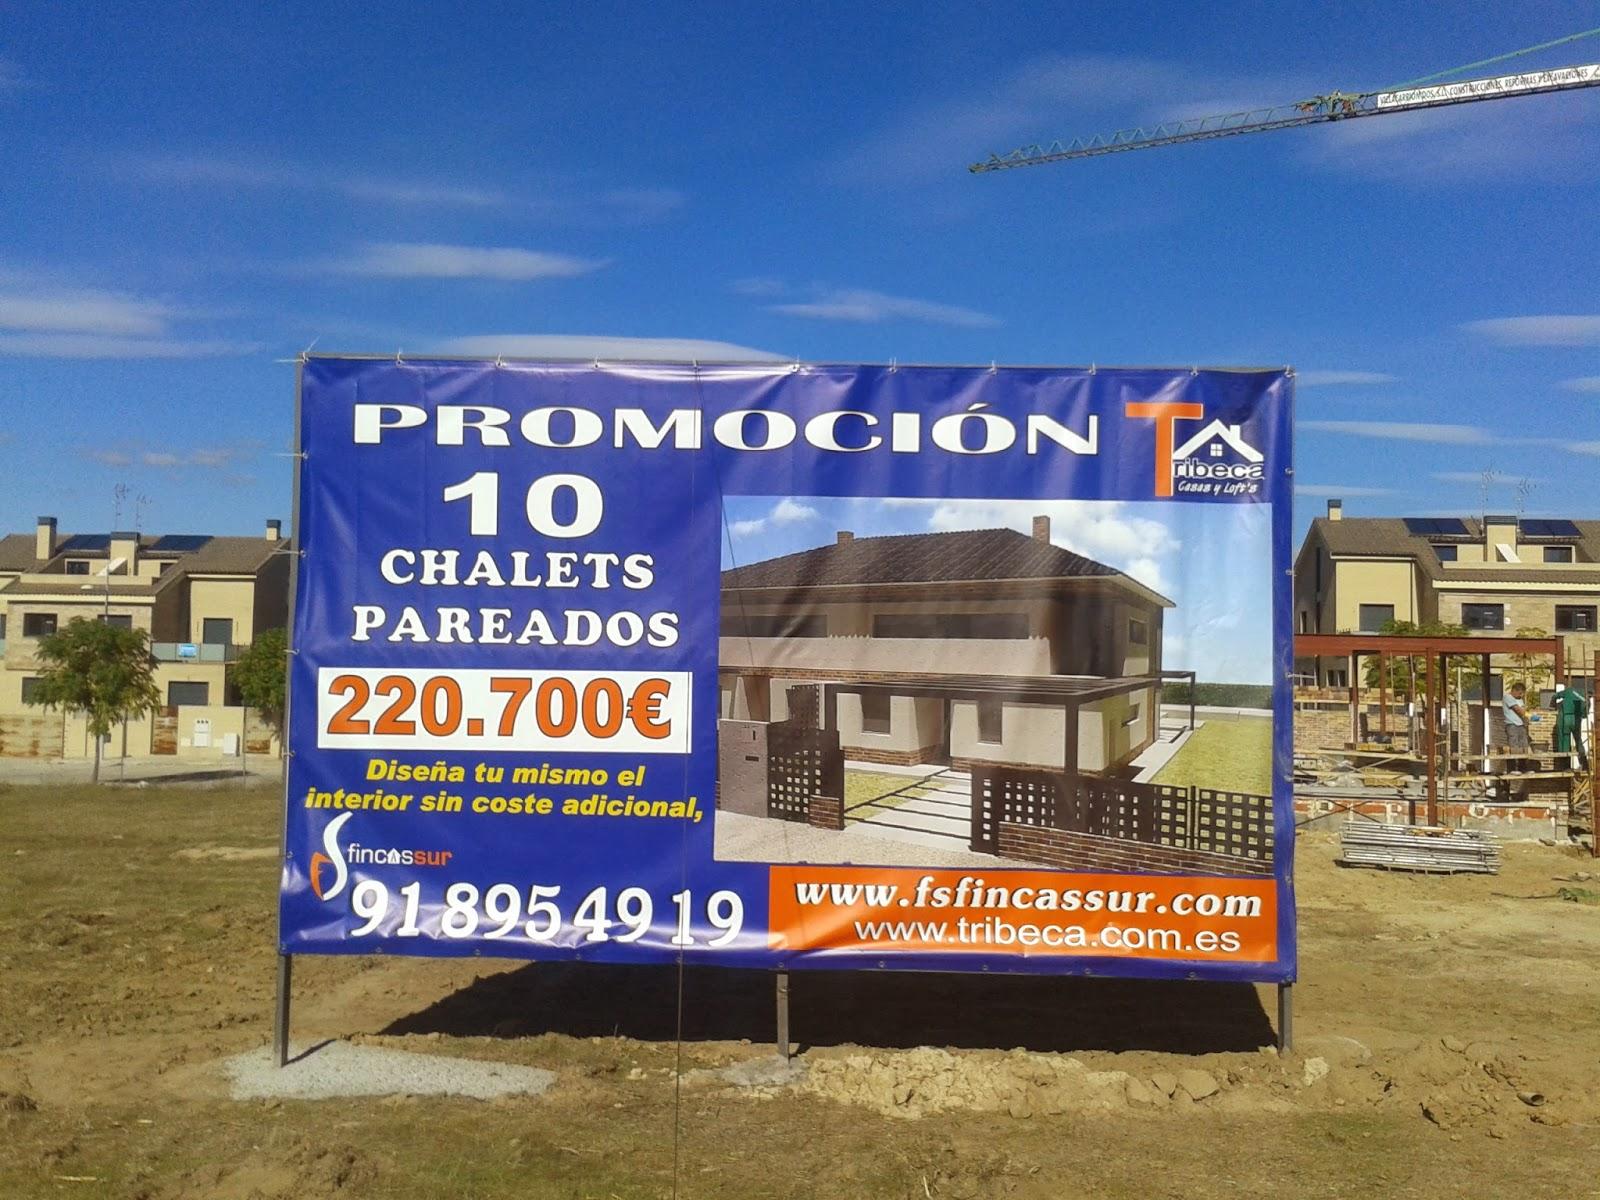 Real Estate Fincassur Inmobiliaria Valla Promocional De Villanueva